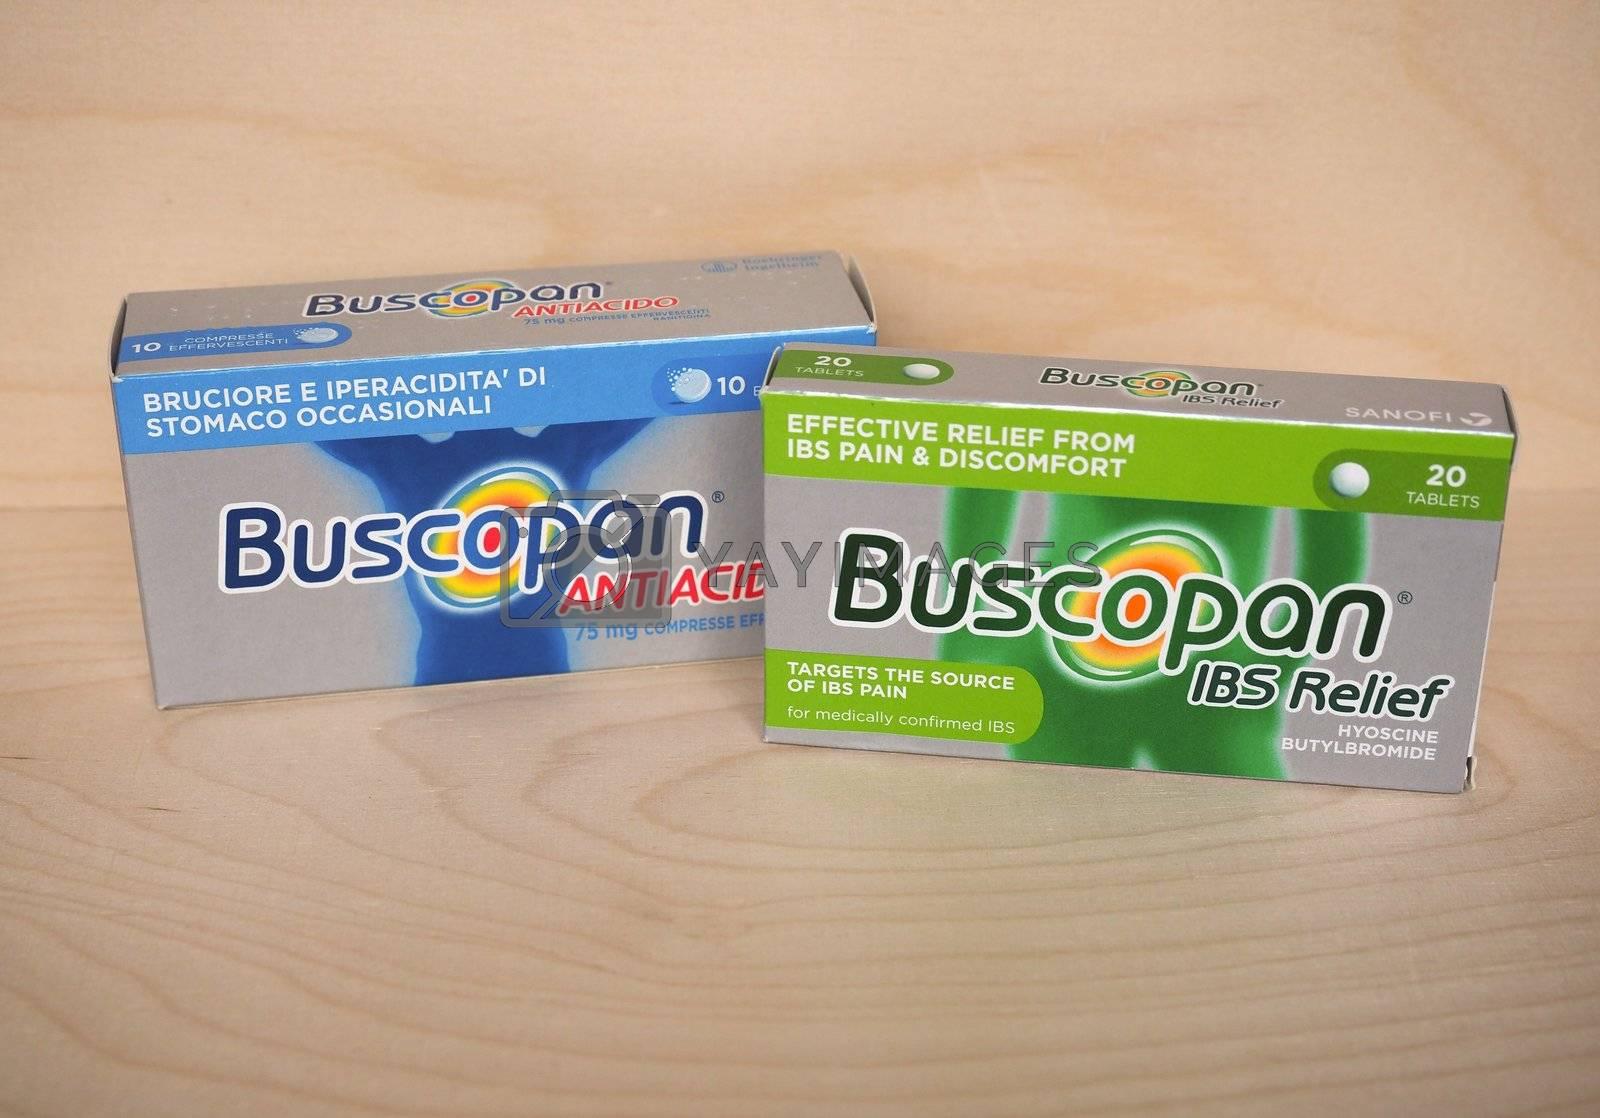 LONDON, UK - CIRCA MAY 2020: Sanofi Buscopan IBS Relief tablets of Hyoscine Butylbromide and Antacid pills